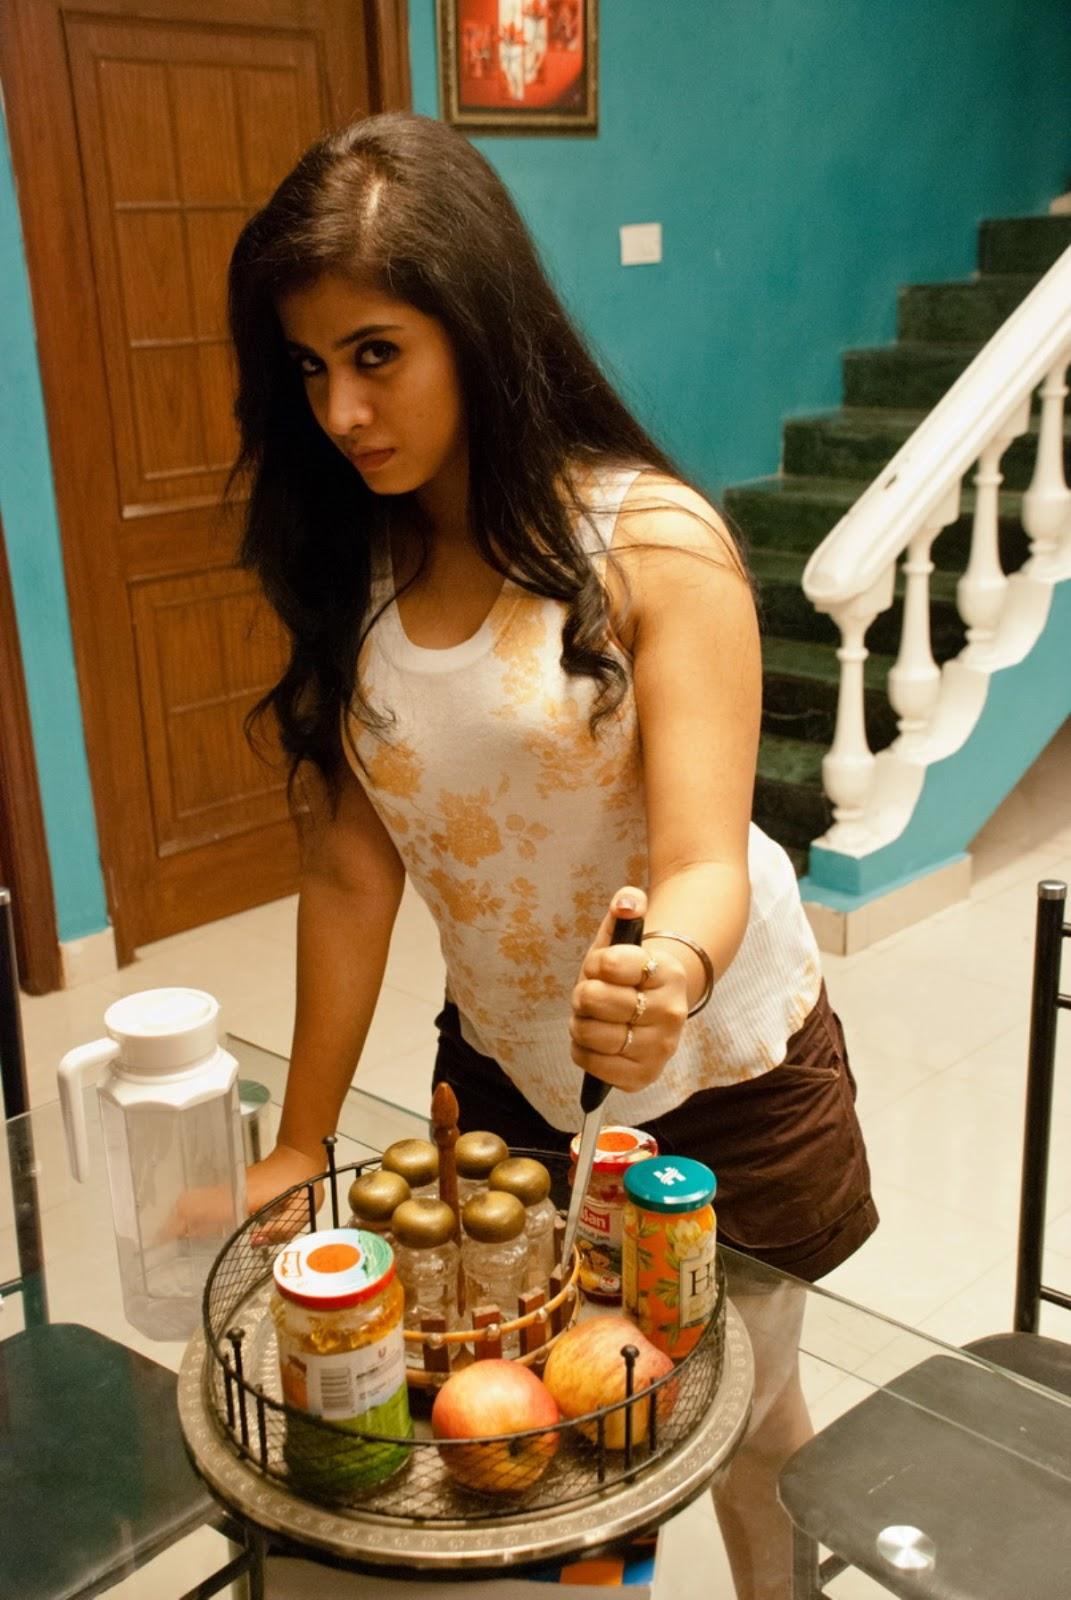 Swati Dixit Hot Stills From Break Up Movie - Hot Blog Photos-9942